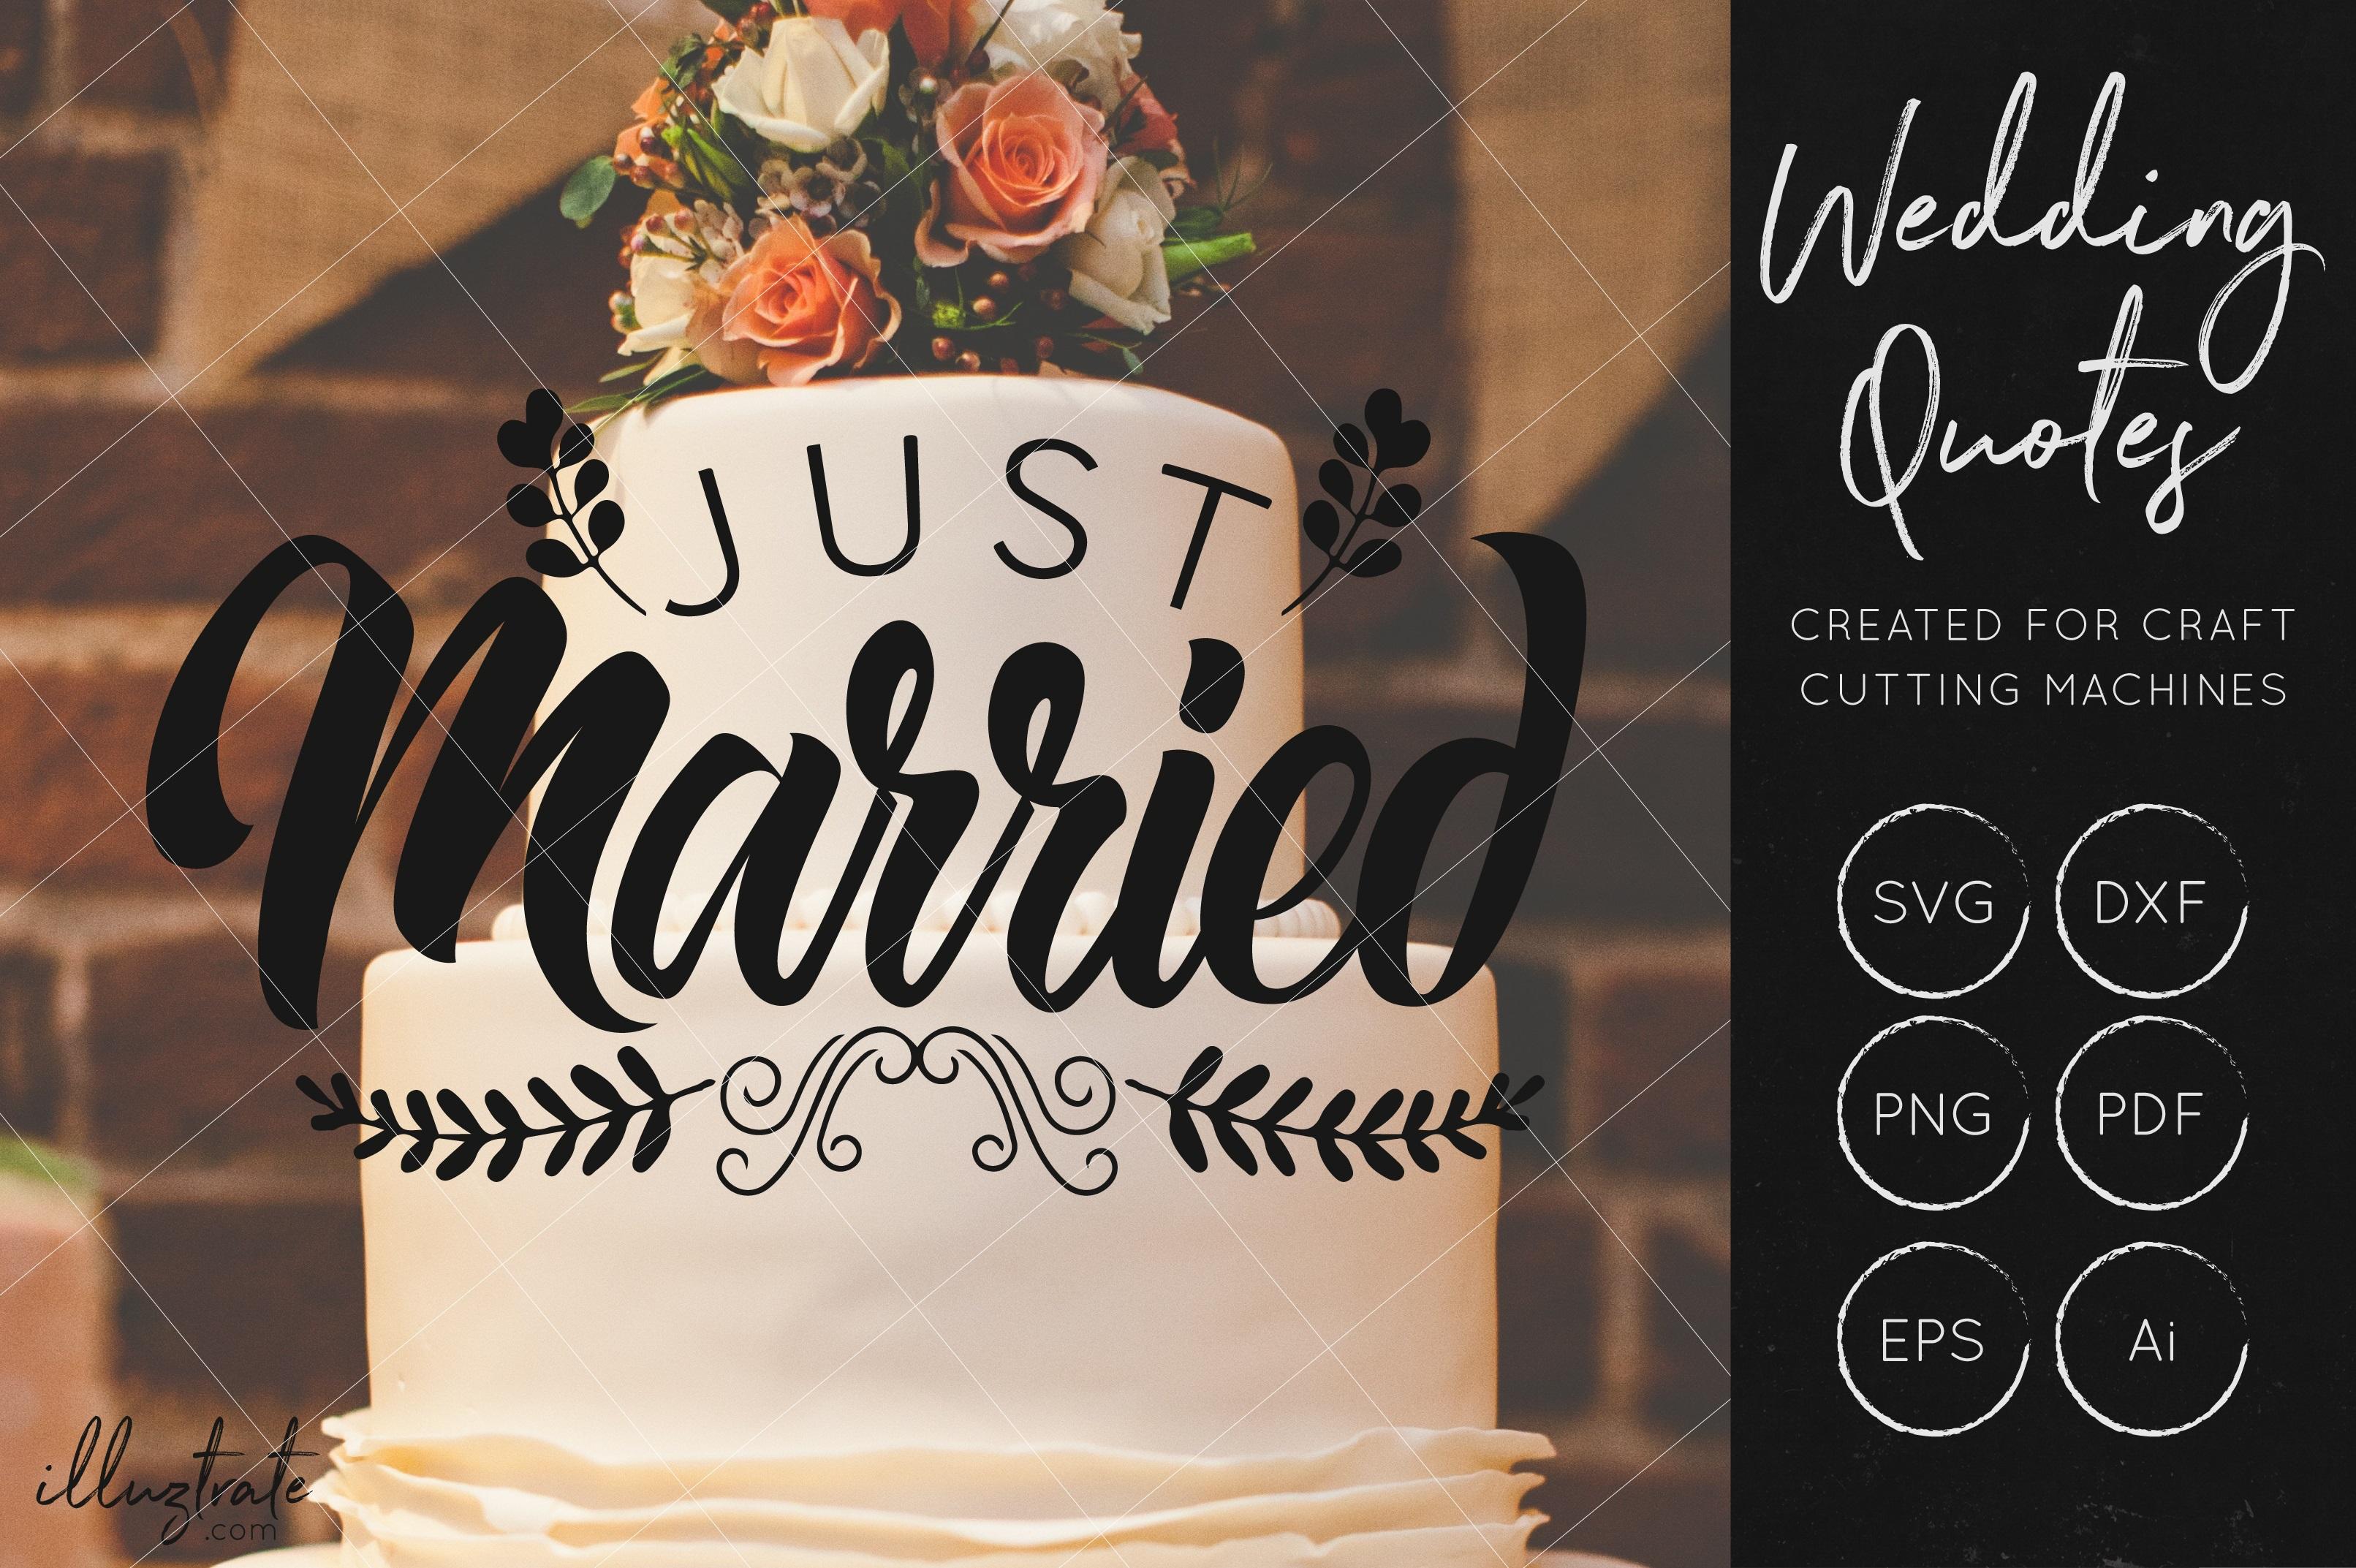 Wedding SVG Cut Files Bundle - Wedding Quotes - Wedding SVG example image 6